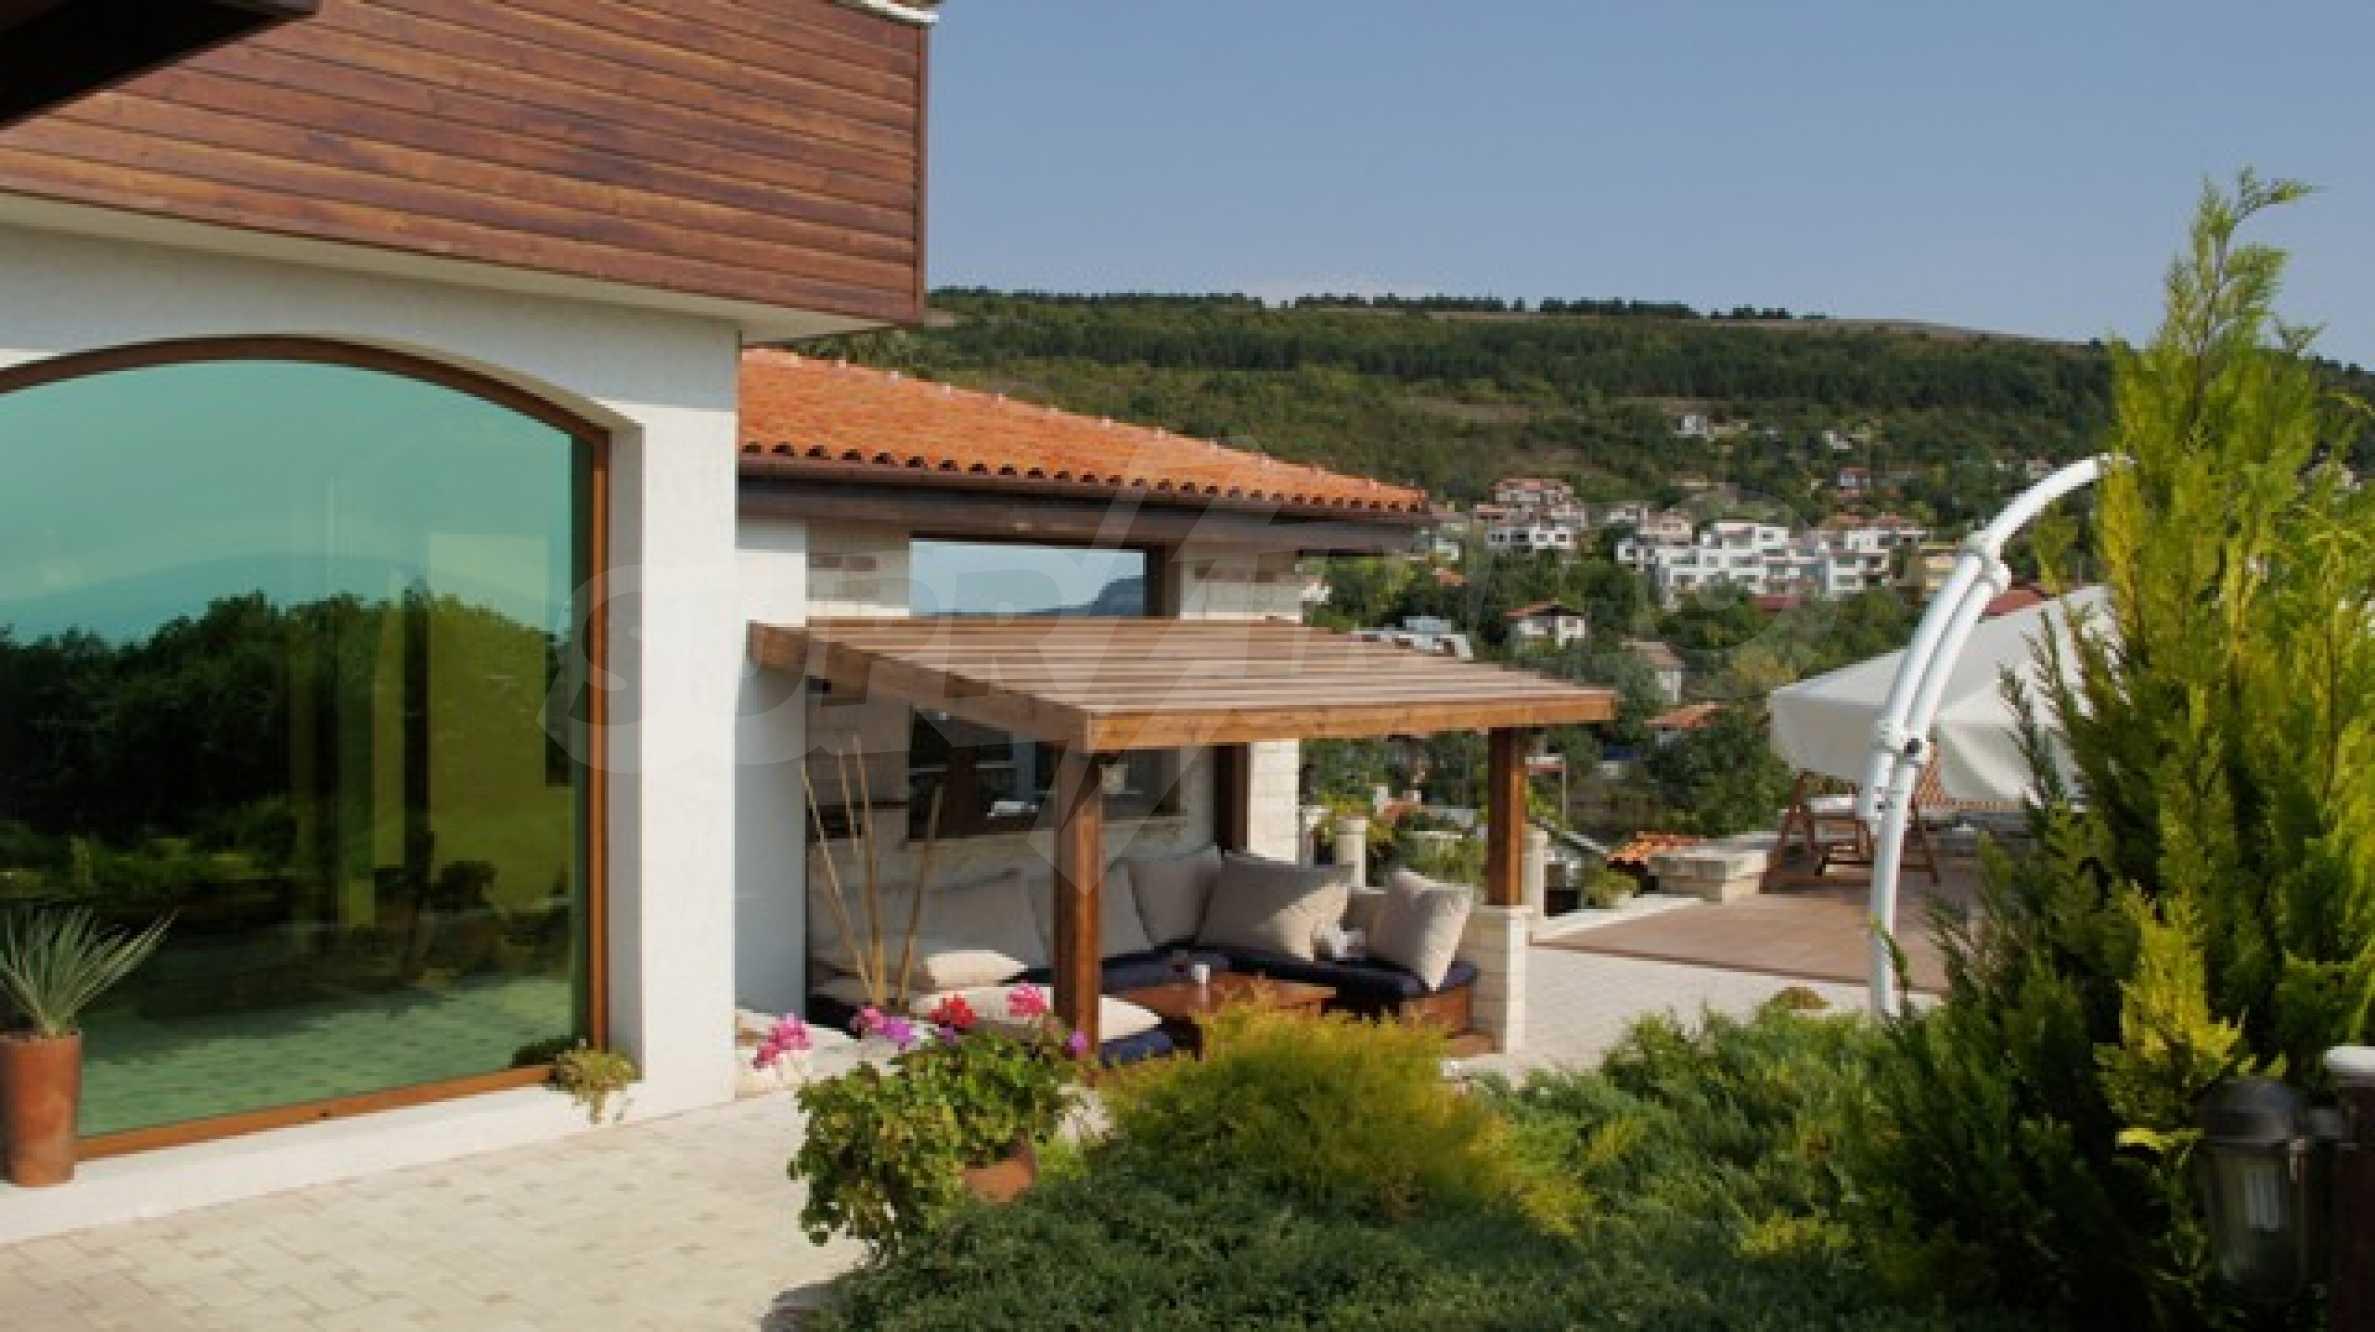 The Mediterranean style - a sense of luxury 23